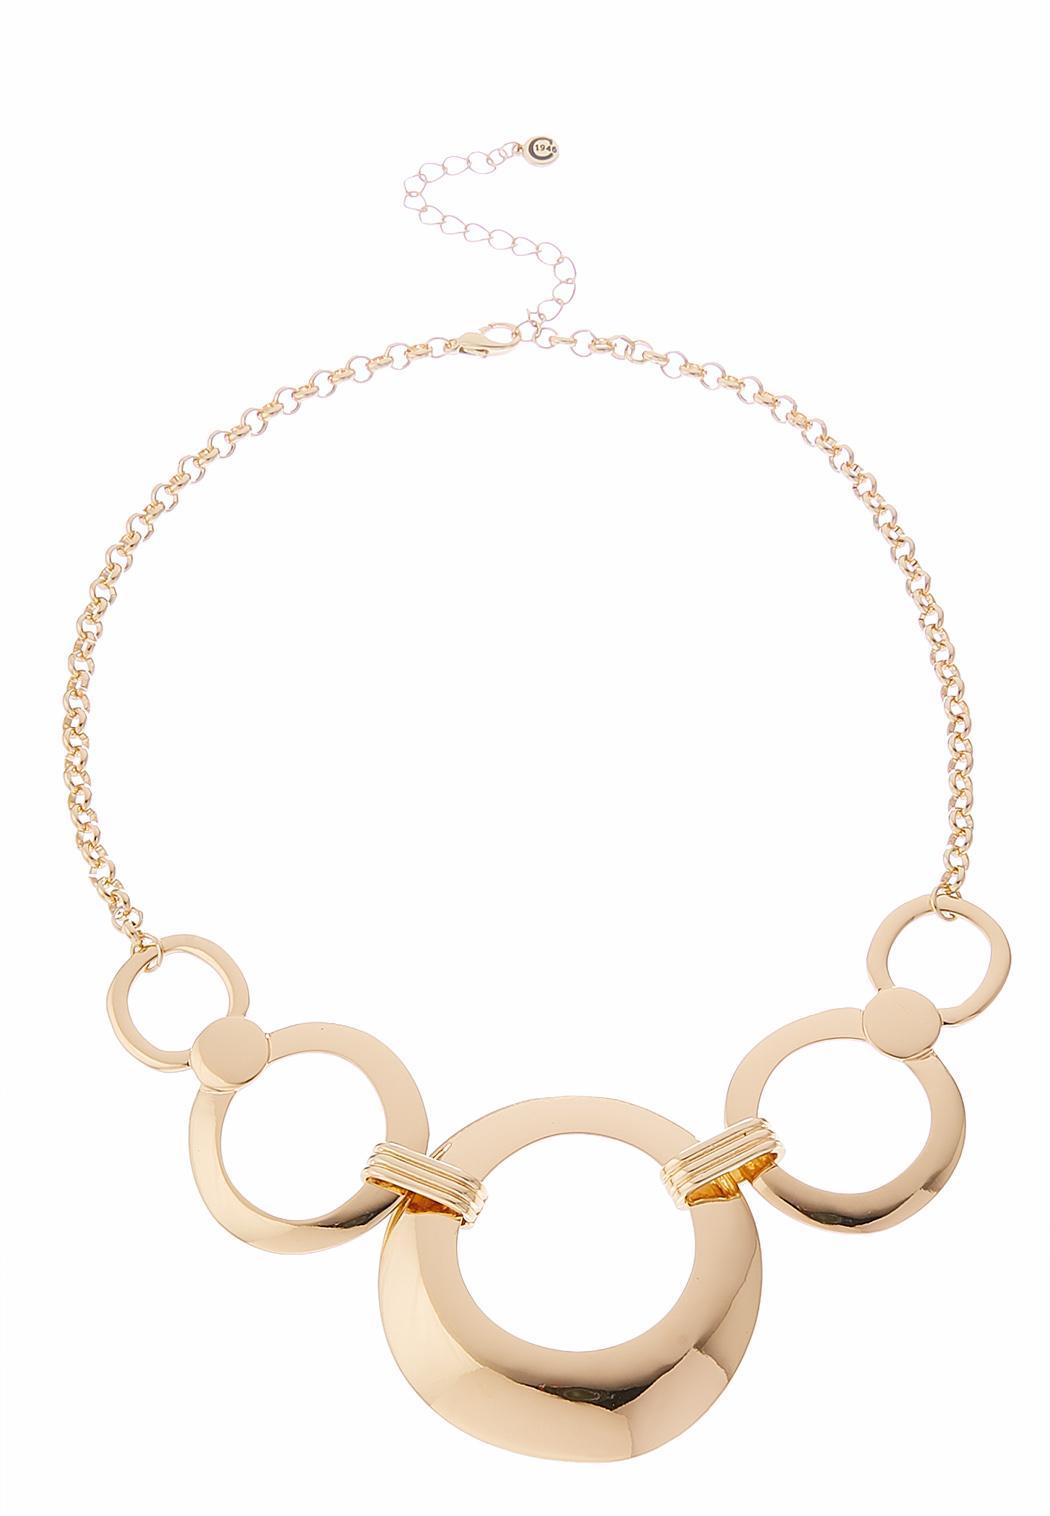 Chain Hoop Bib Necklace